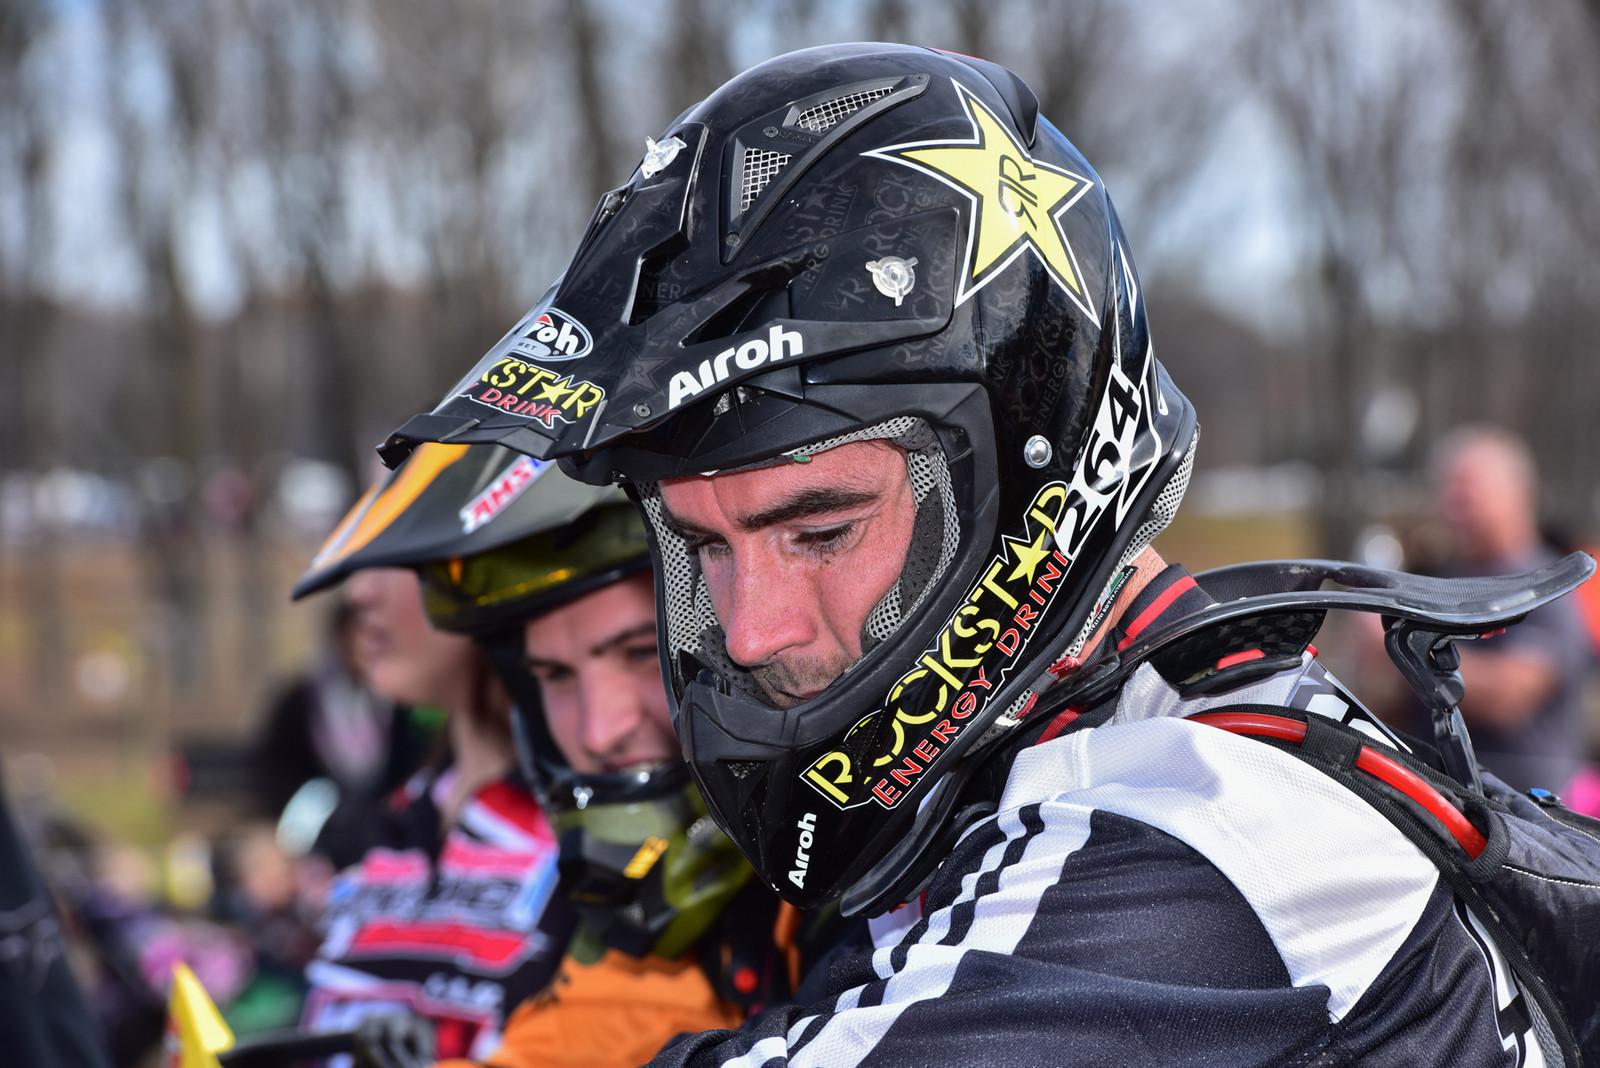 Ryan Sipes - Photo Blast: Ironman GNCC - Motocross Pictures - Vital MX